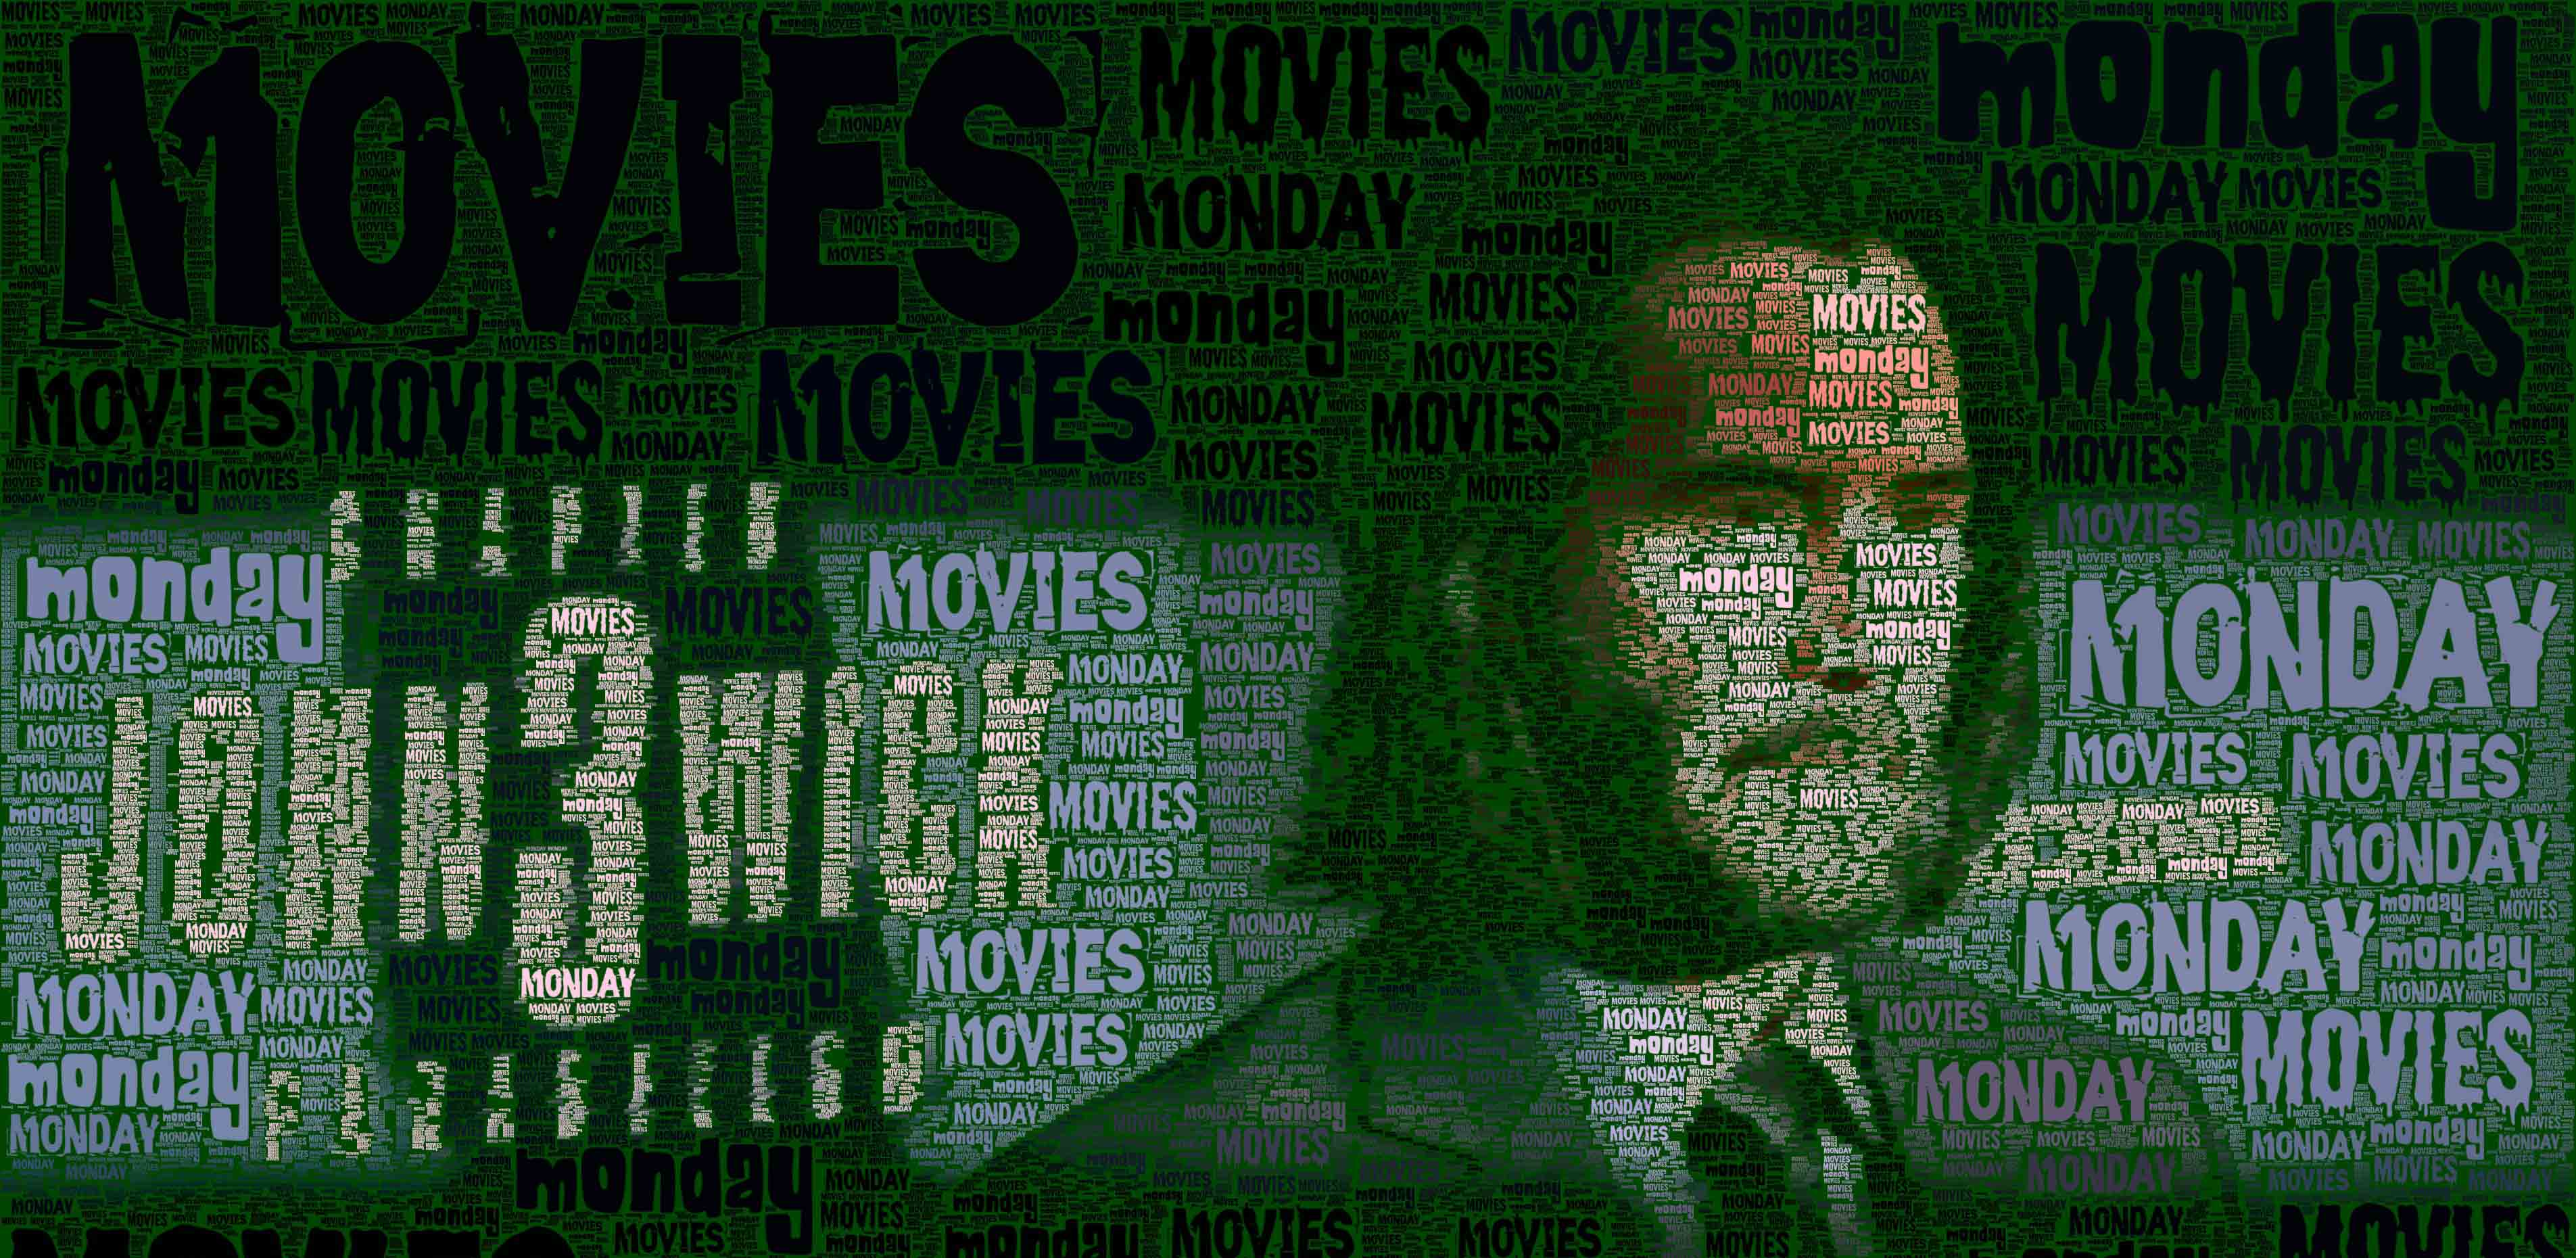 Jan 27th ~ Movie Monday